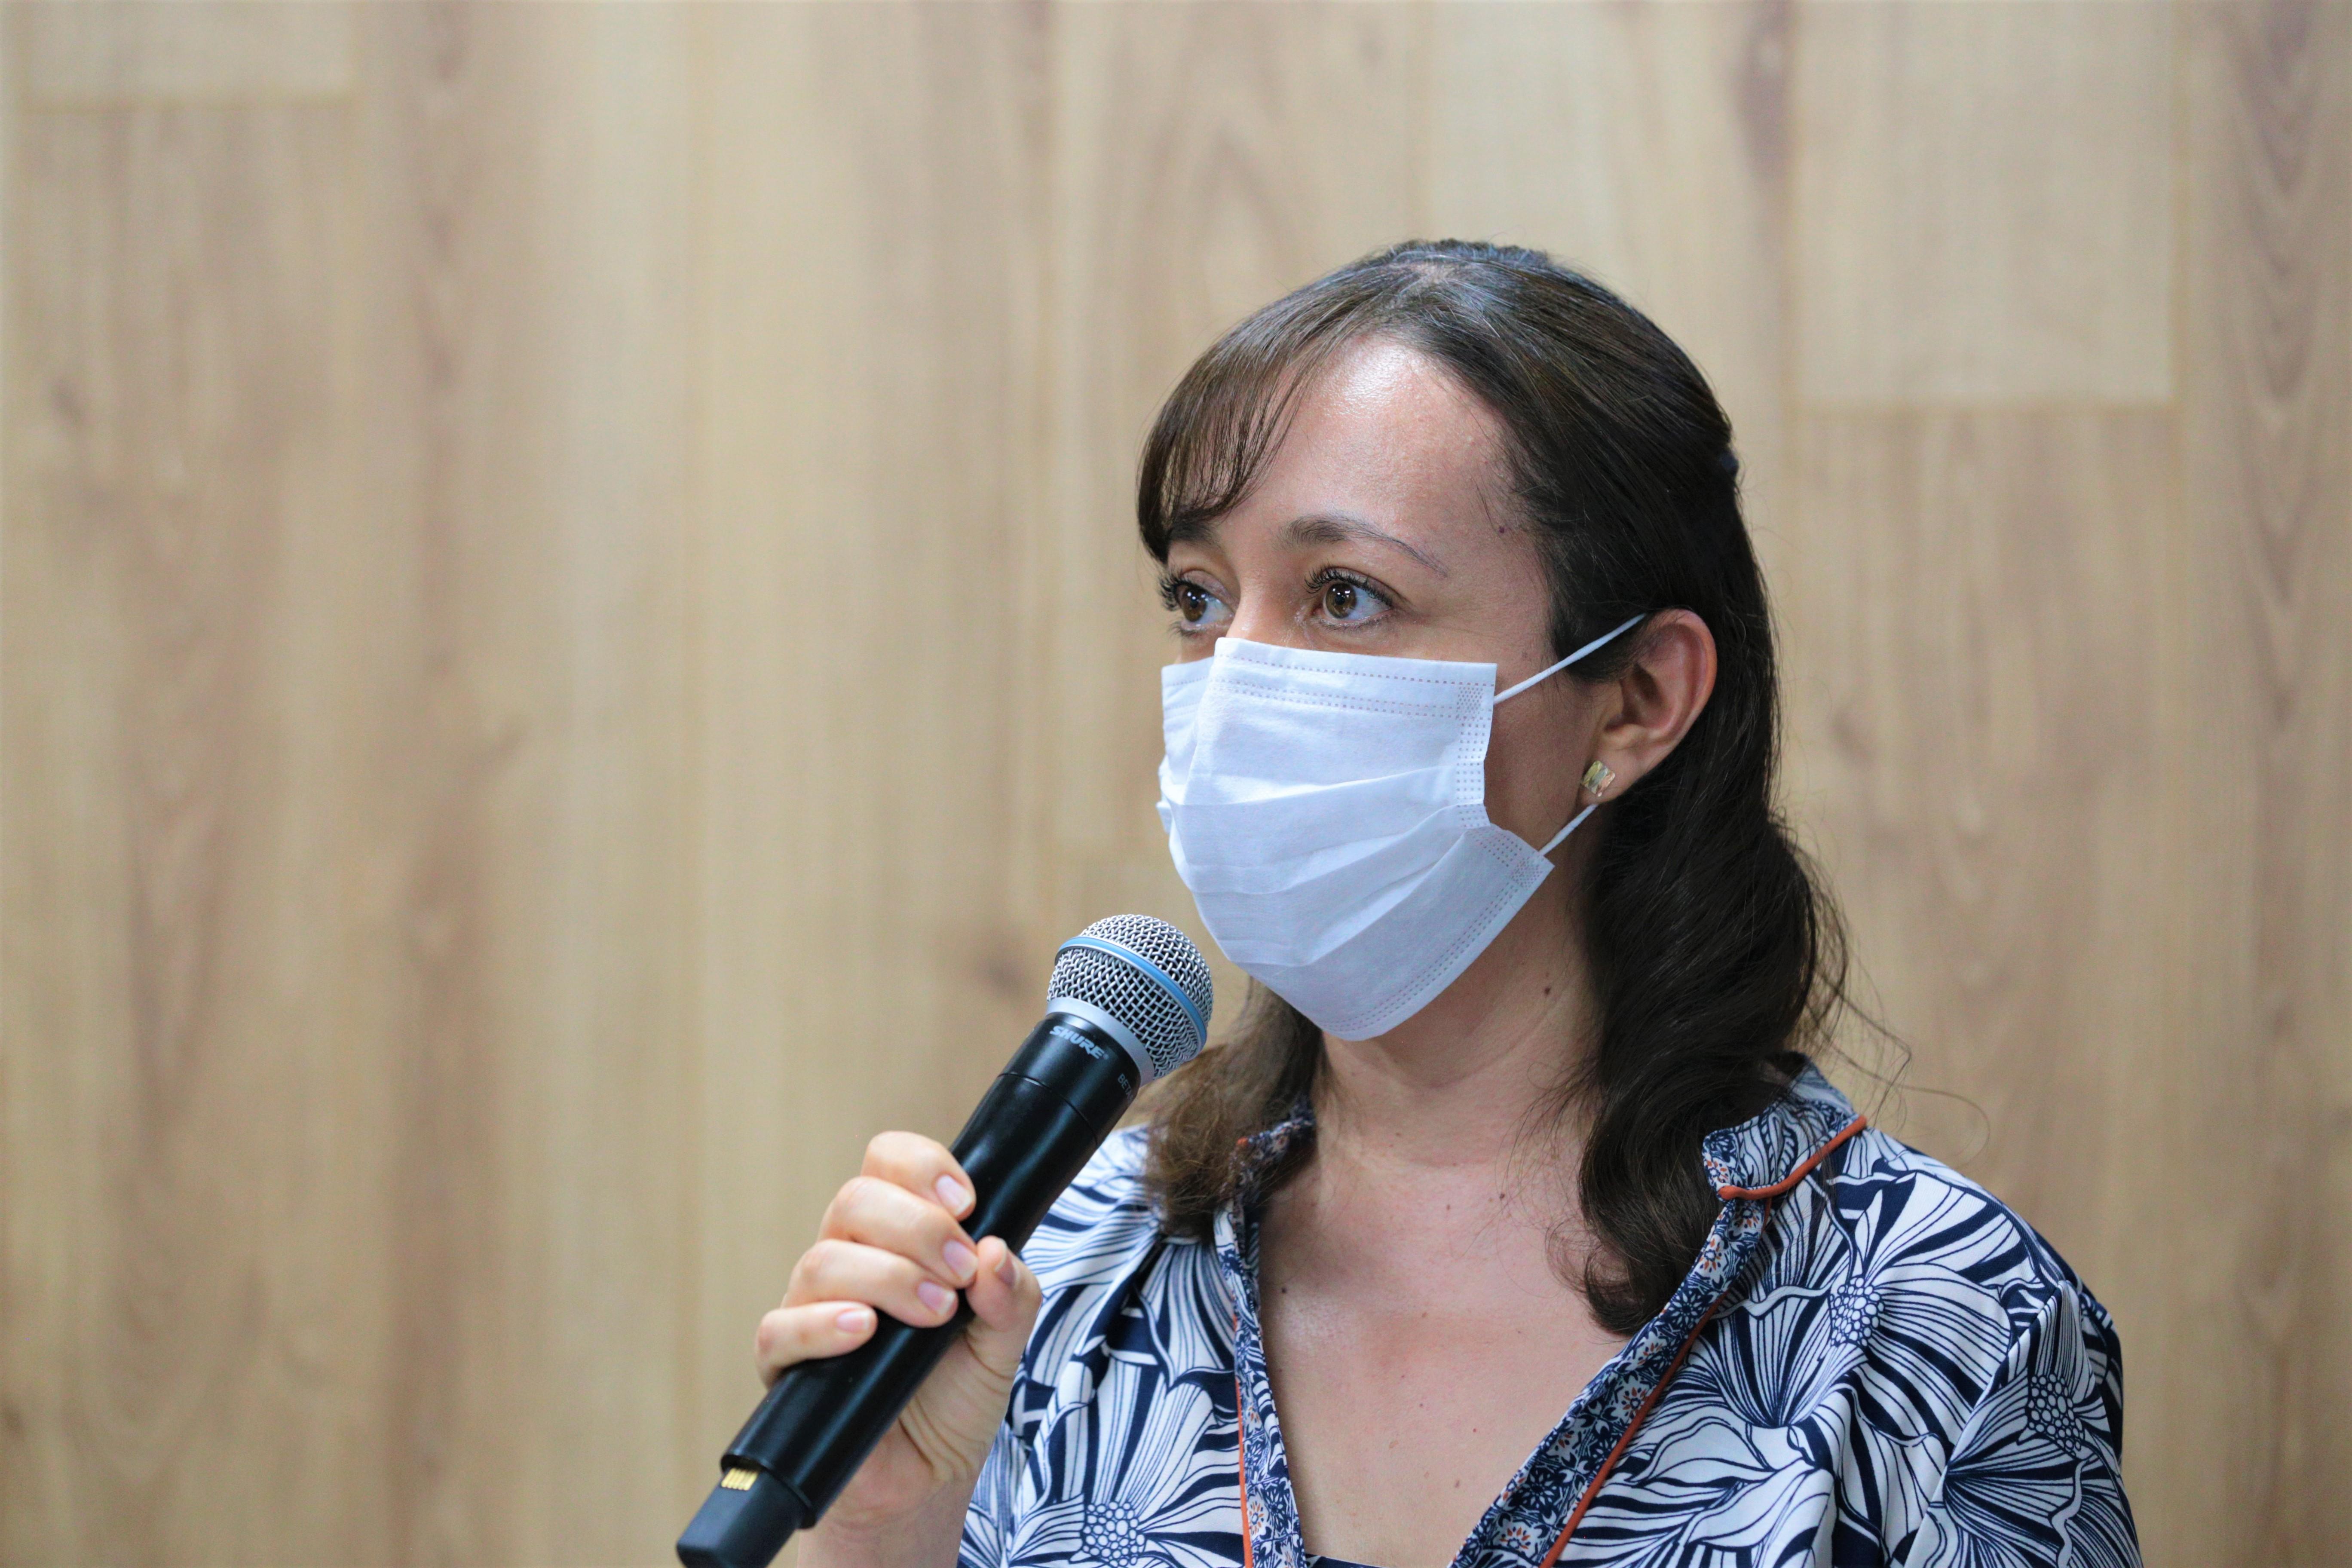 Jefa Salud Pública CUCS al micrófono